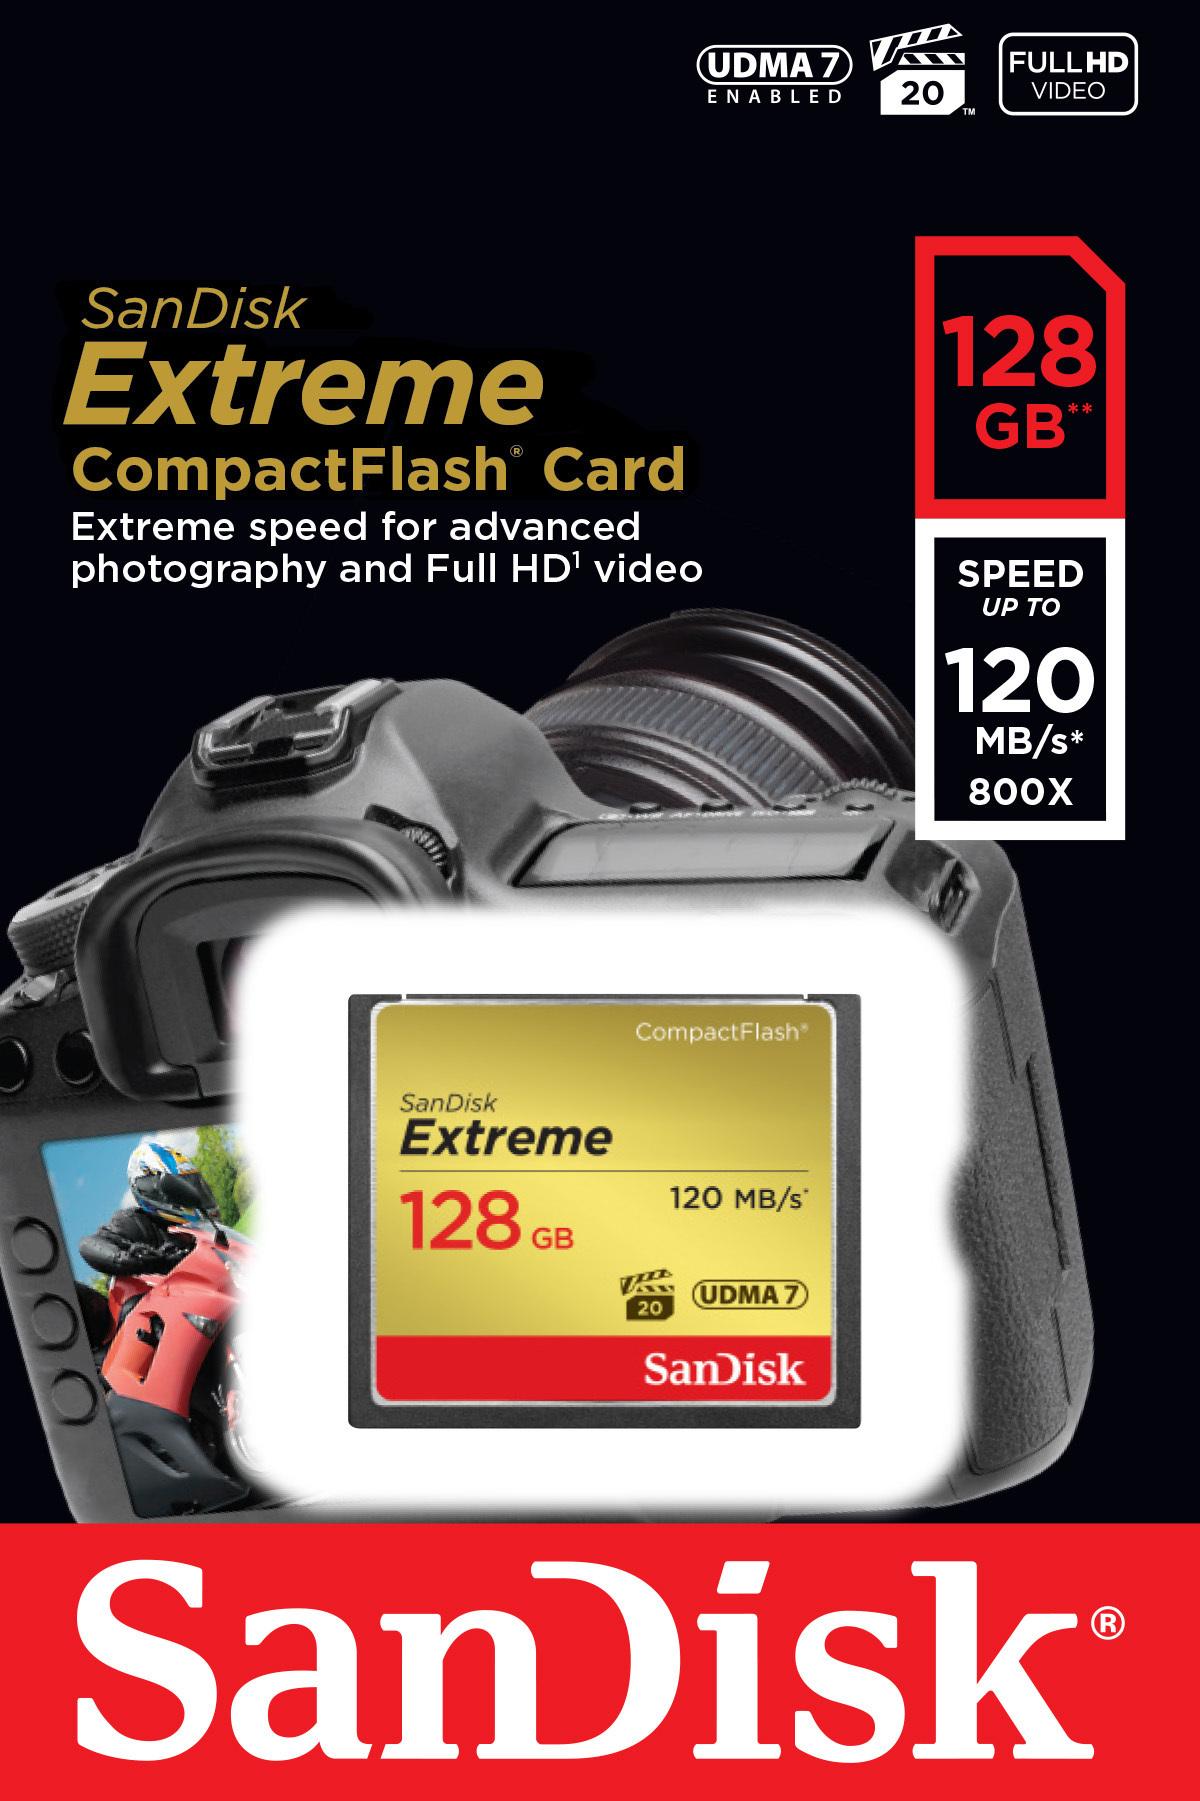 SanDisk SDCFXSB-128G-G46 - KARTA EXTREME CF 128GB 120MB/s SanDisk SDCFXSB-128G-G46